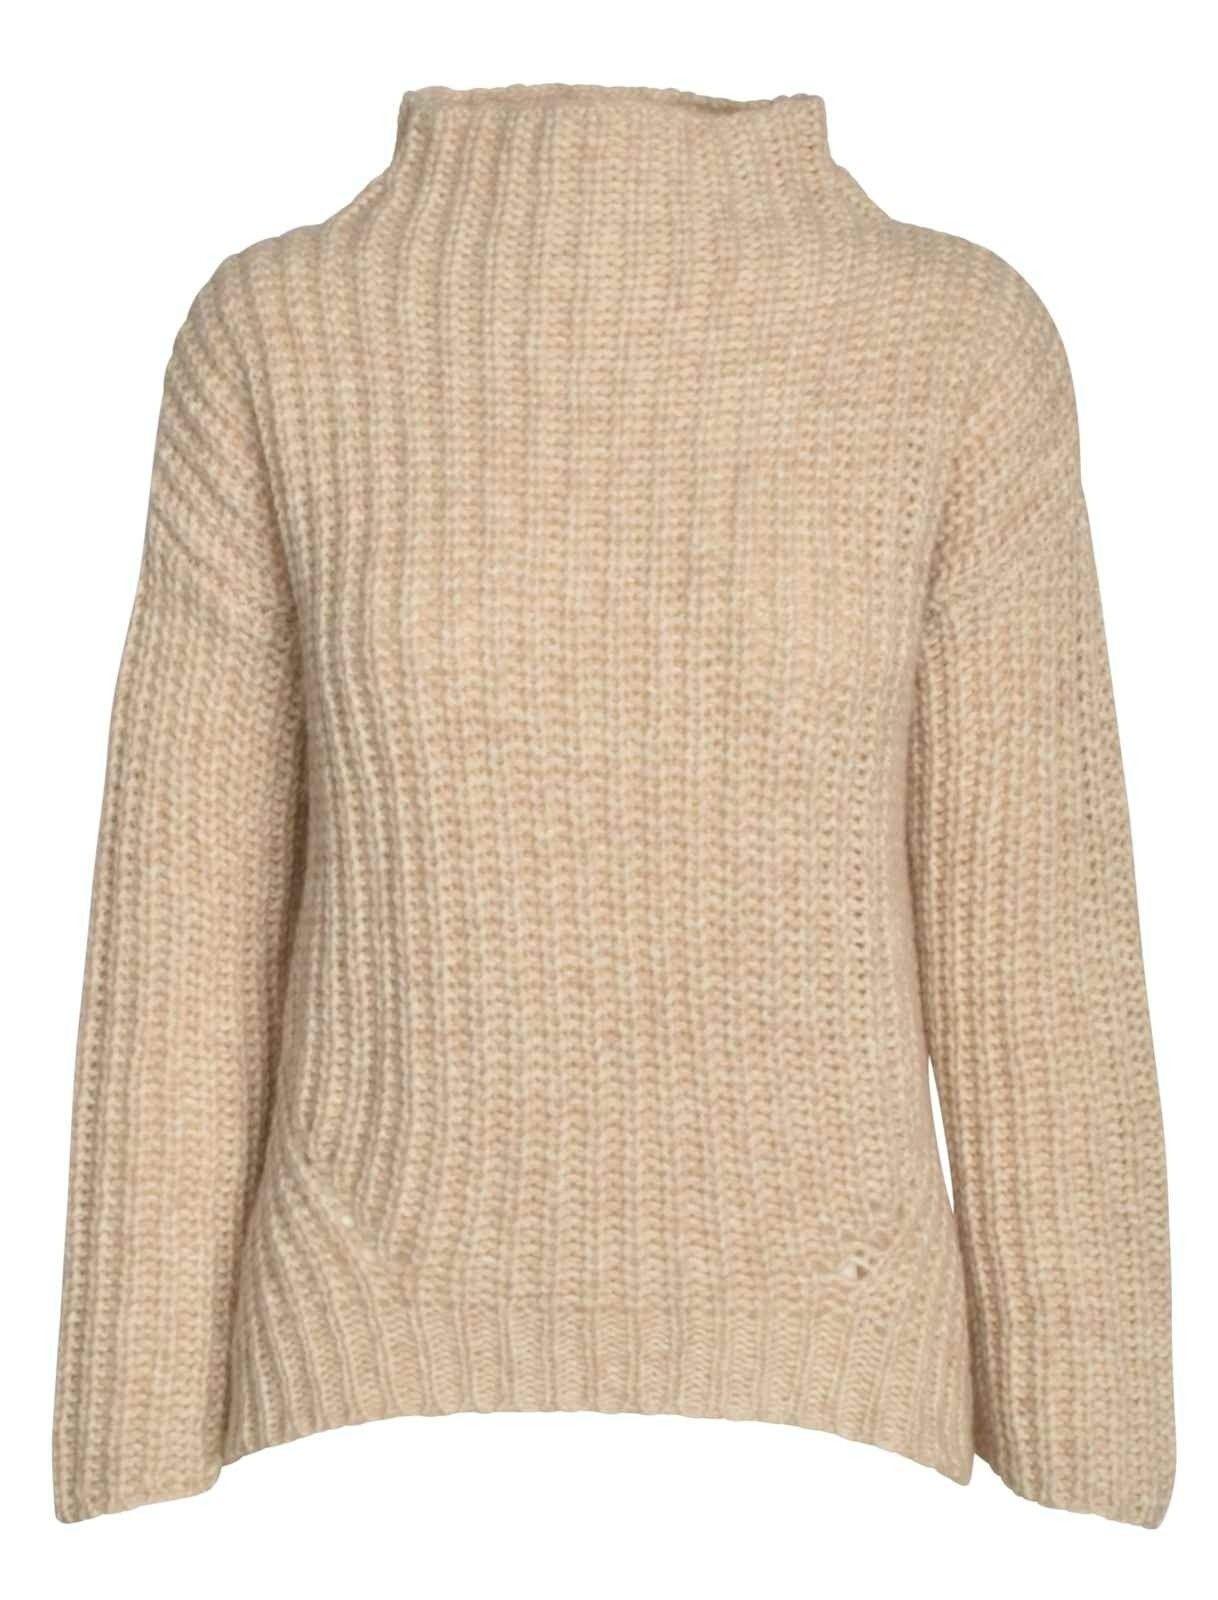 ZOE ONA - Damen Pullover - Grobstrick High Neck - Light Beige